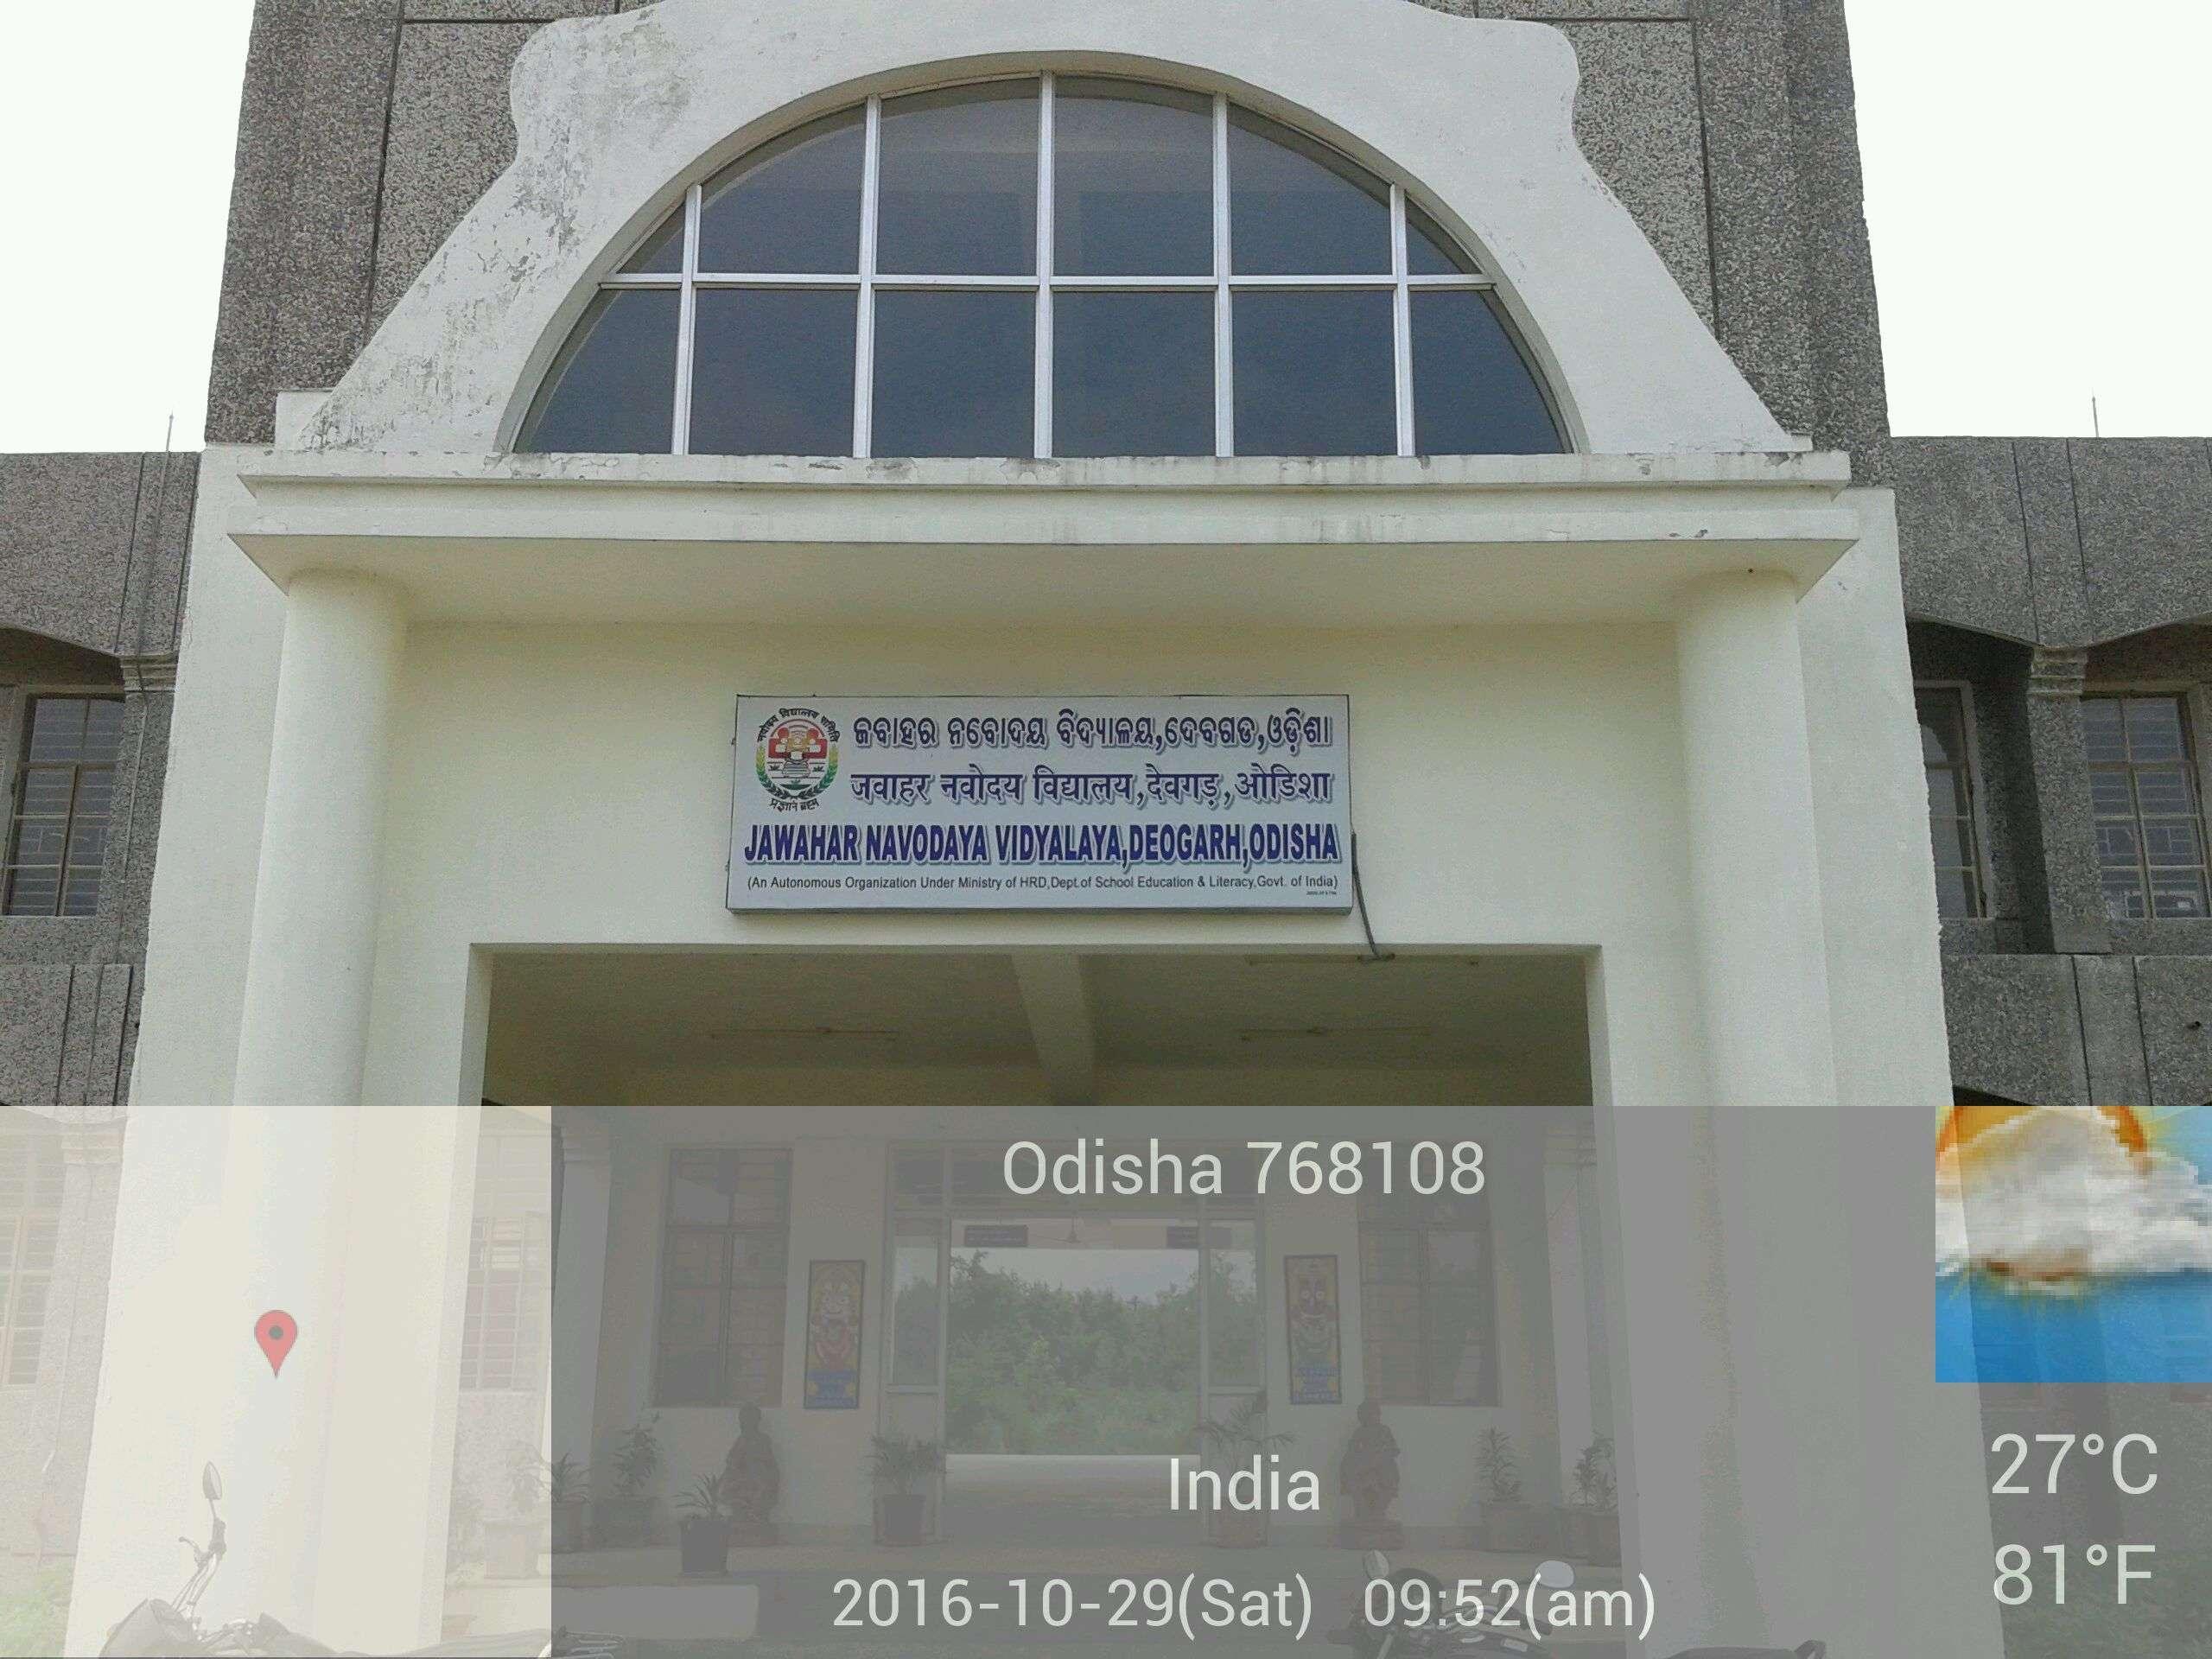 JAWAHAR NAVODAYA VIDYALAYA DEOGARH DISTT ORISSA 1540026